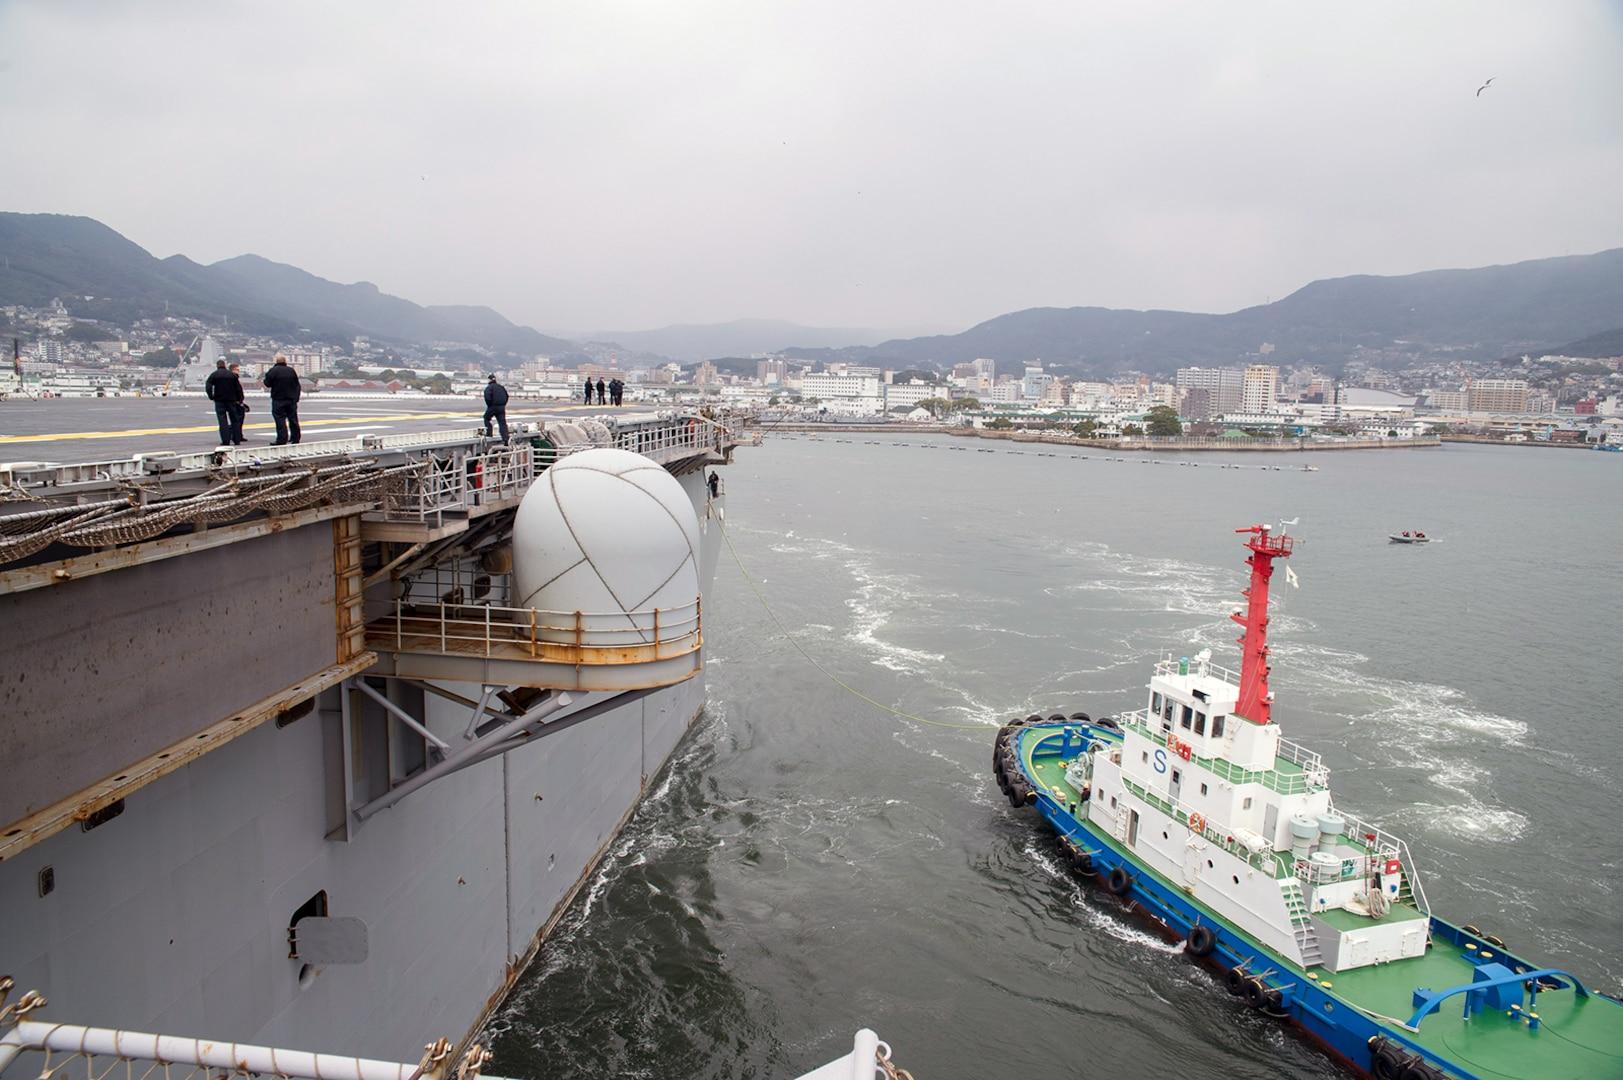 USS Bonhomme Richard (LHD 6) departs Sasebo